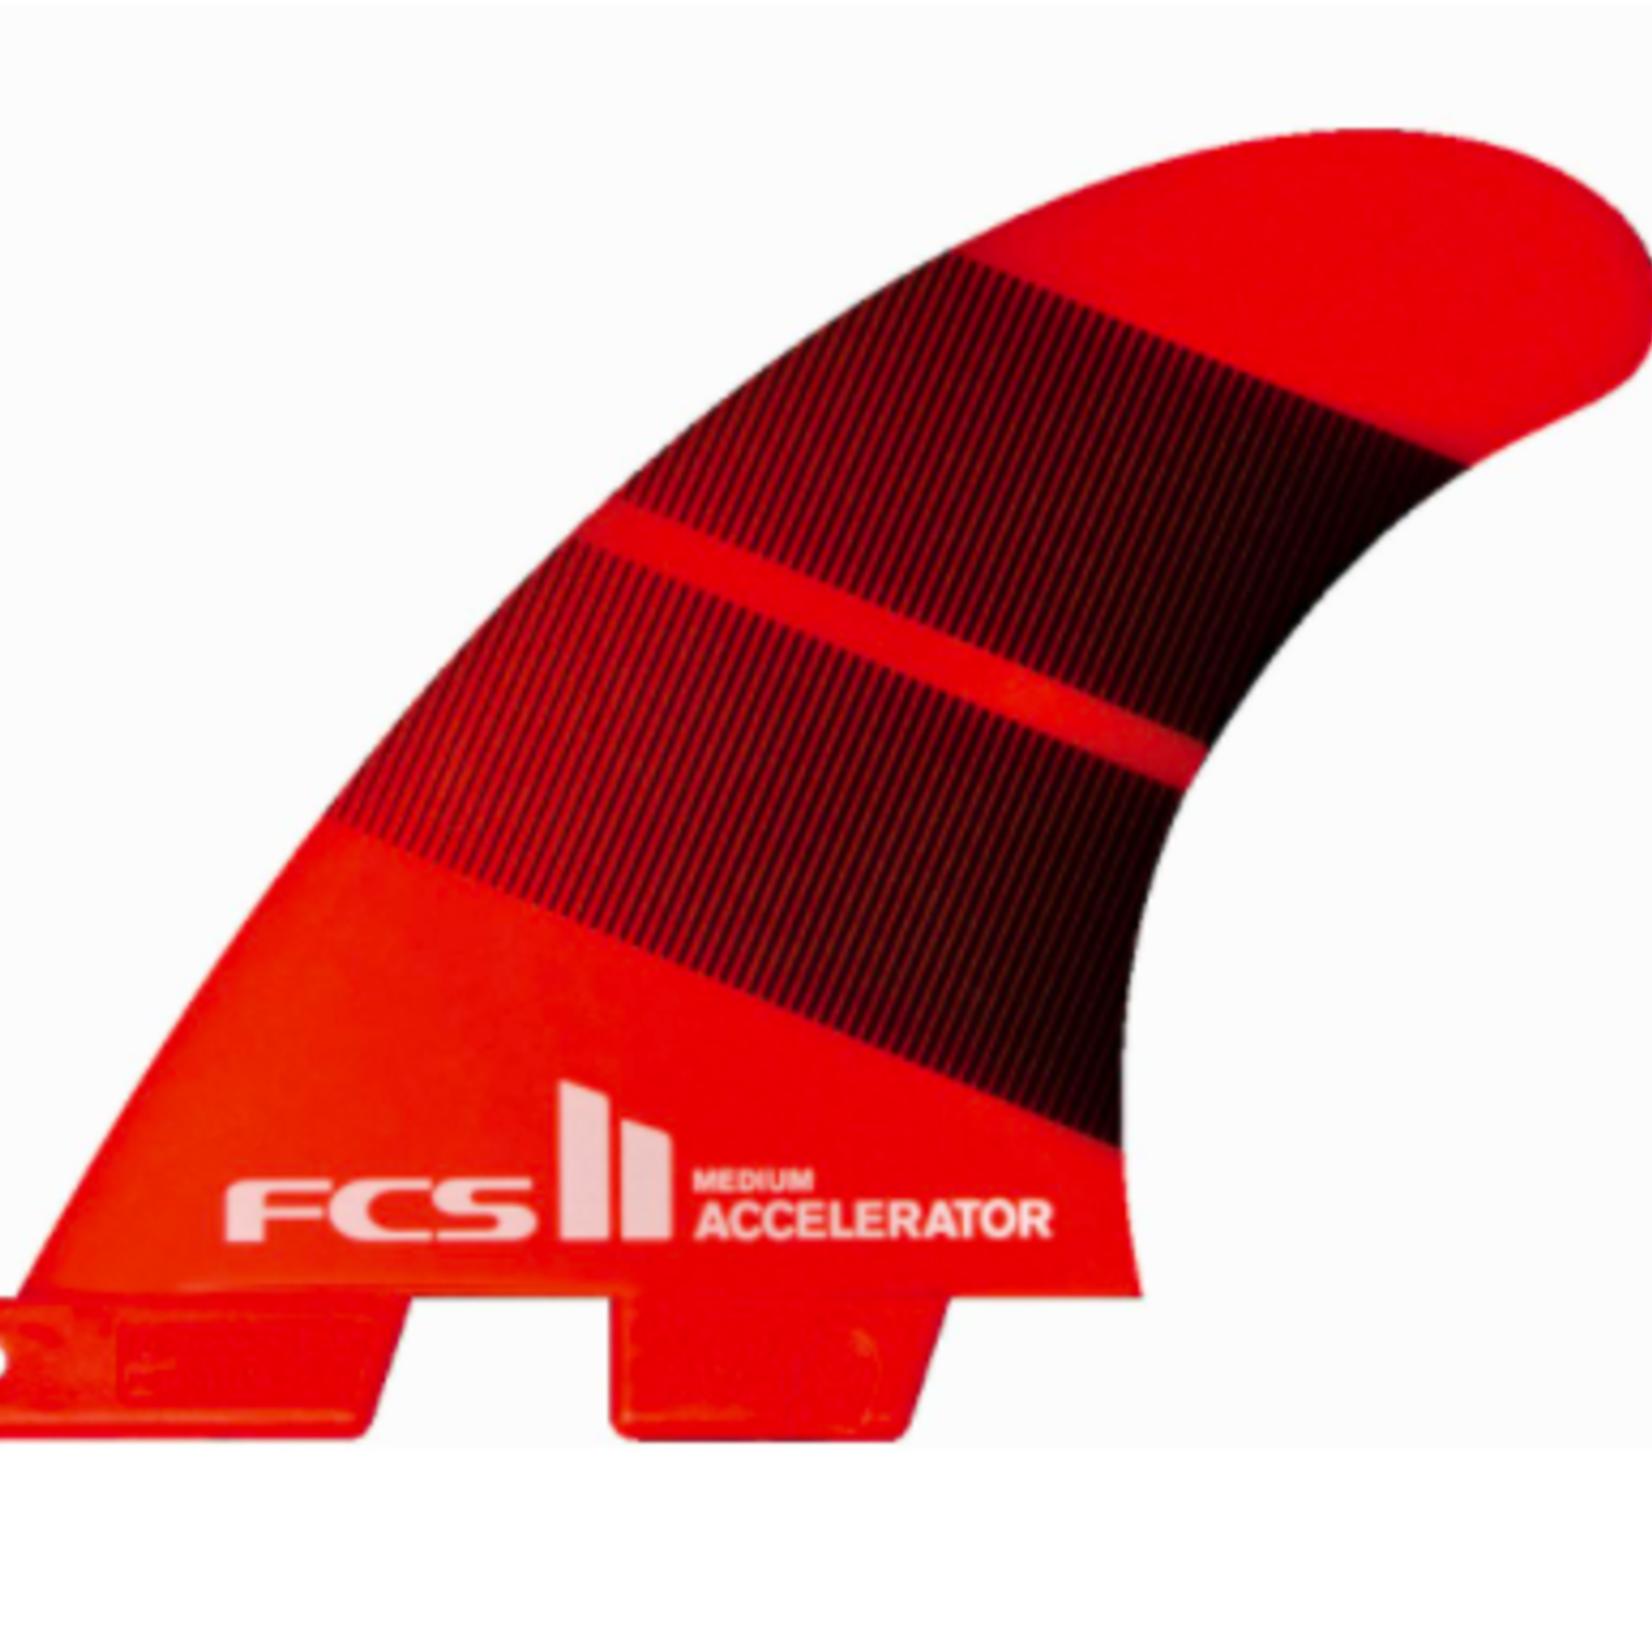 FCS FCS II Accelerator Neo Glass Tang Gradient Tri Fins.